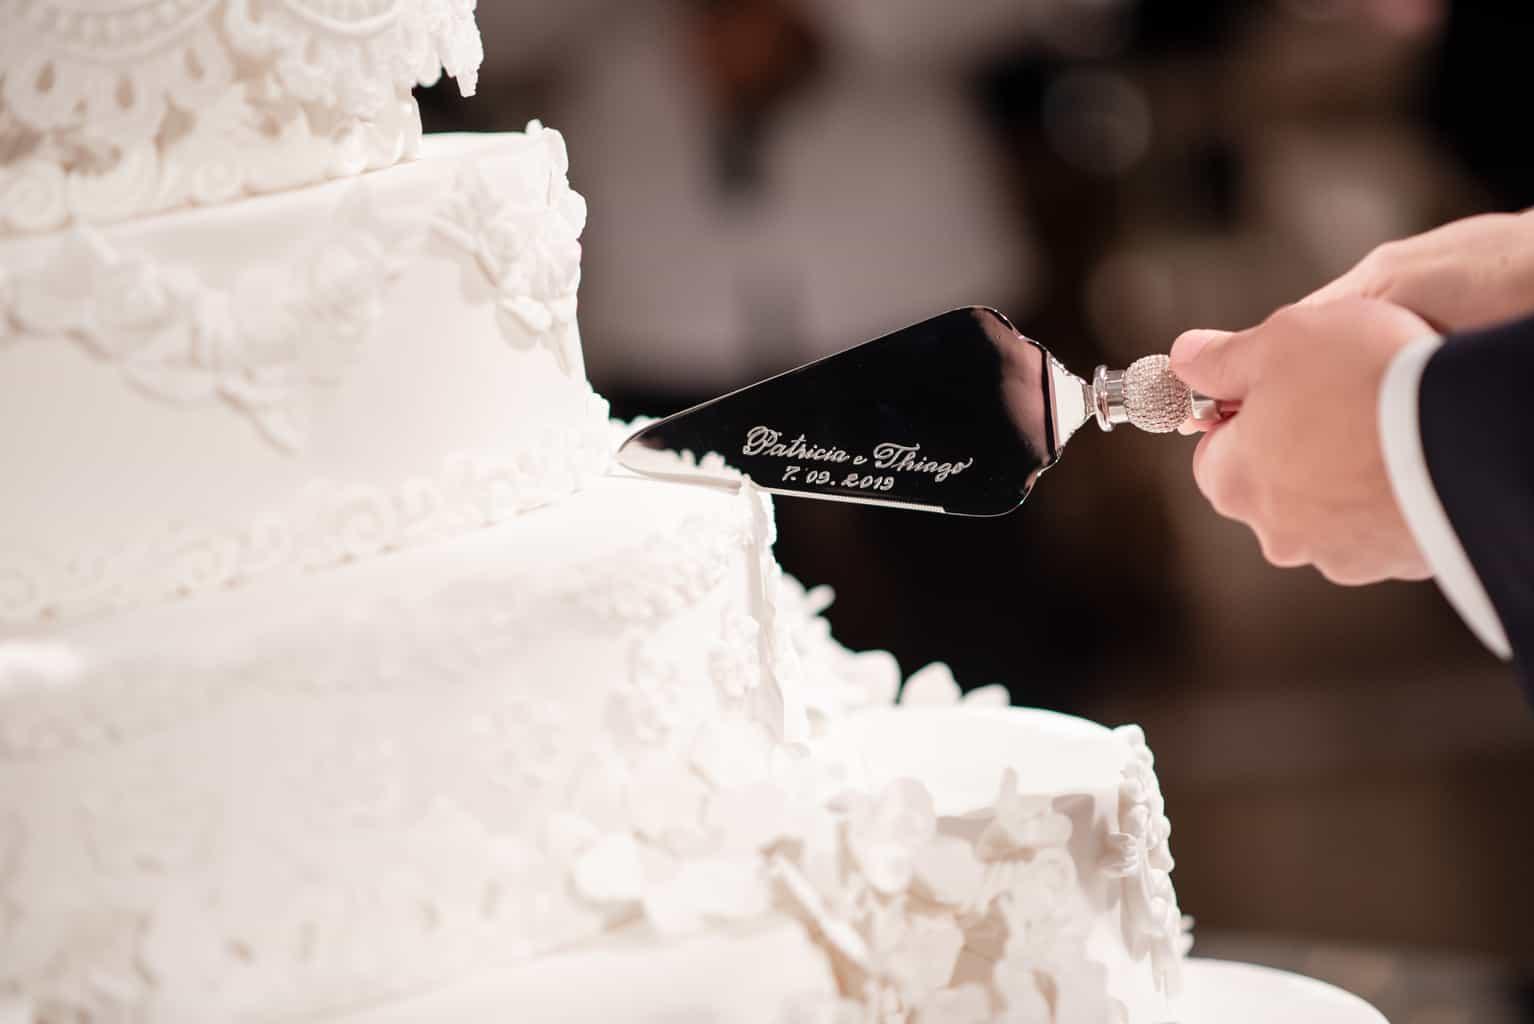 casamento-Patricia-e-Thiago-Copacabana-Palace-Daniel-Curz-A-Roseira-Paula-Rocha-Marina-Fava-decor1378-Patricia-e-Thiago-WAL_4461